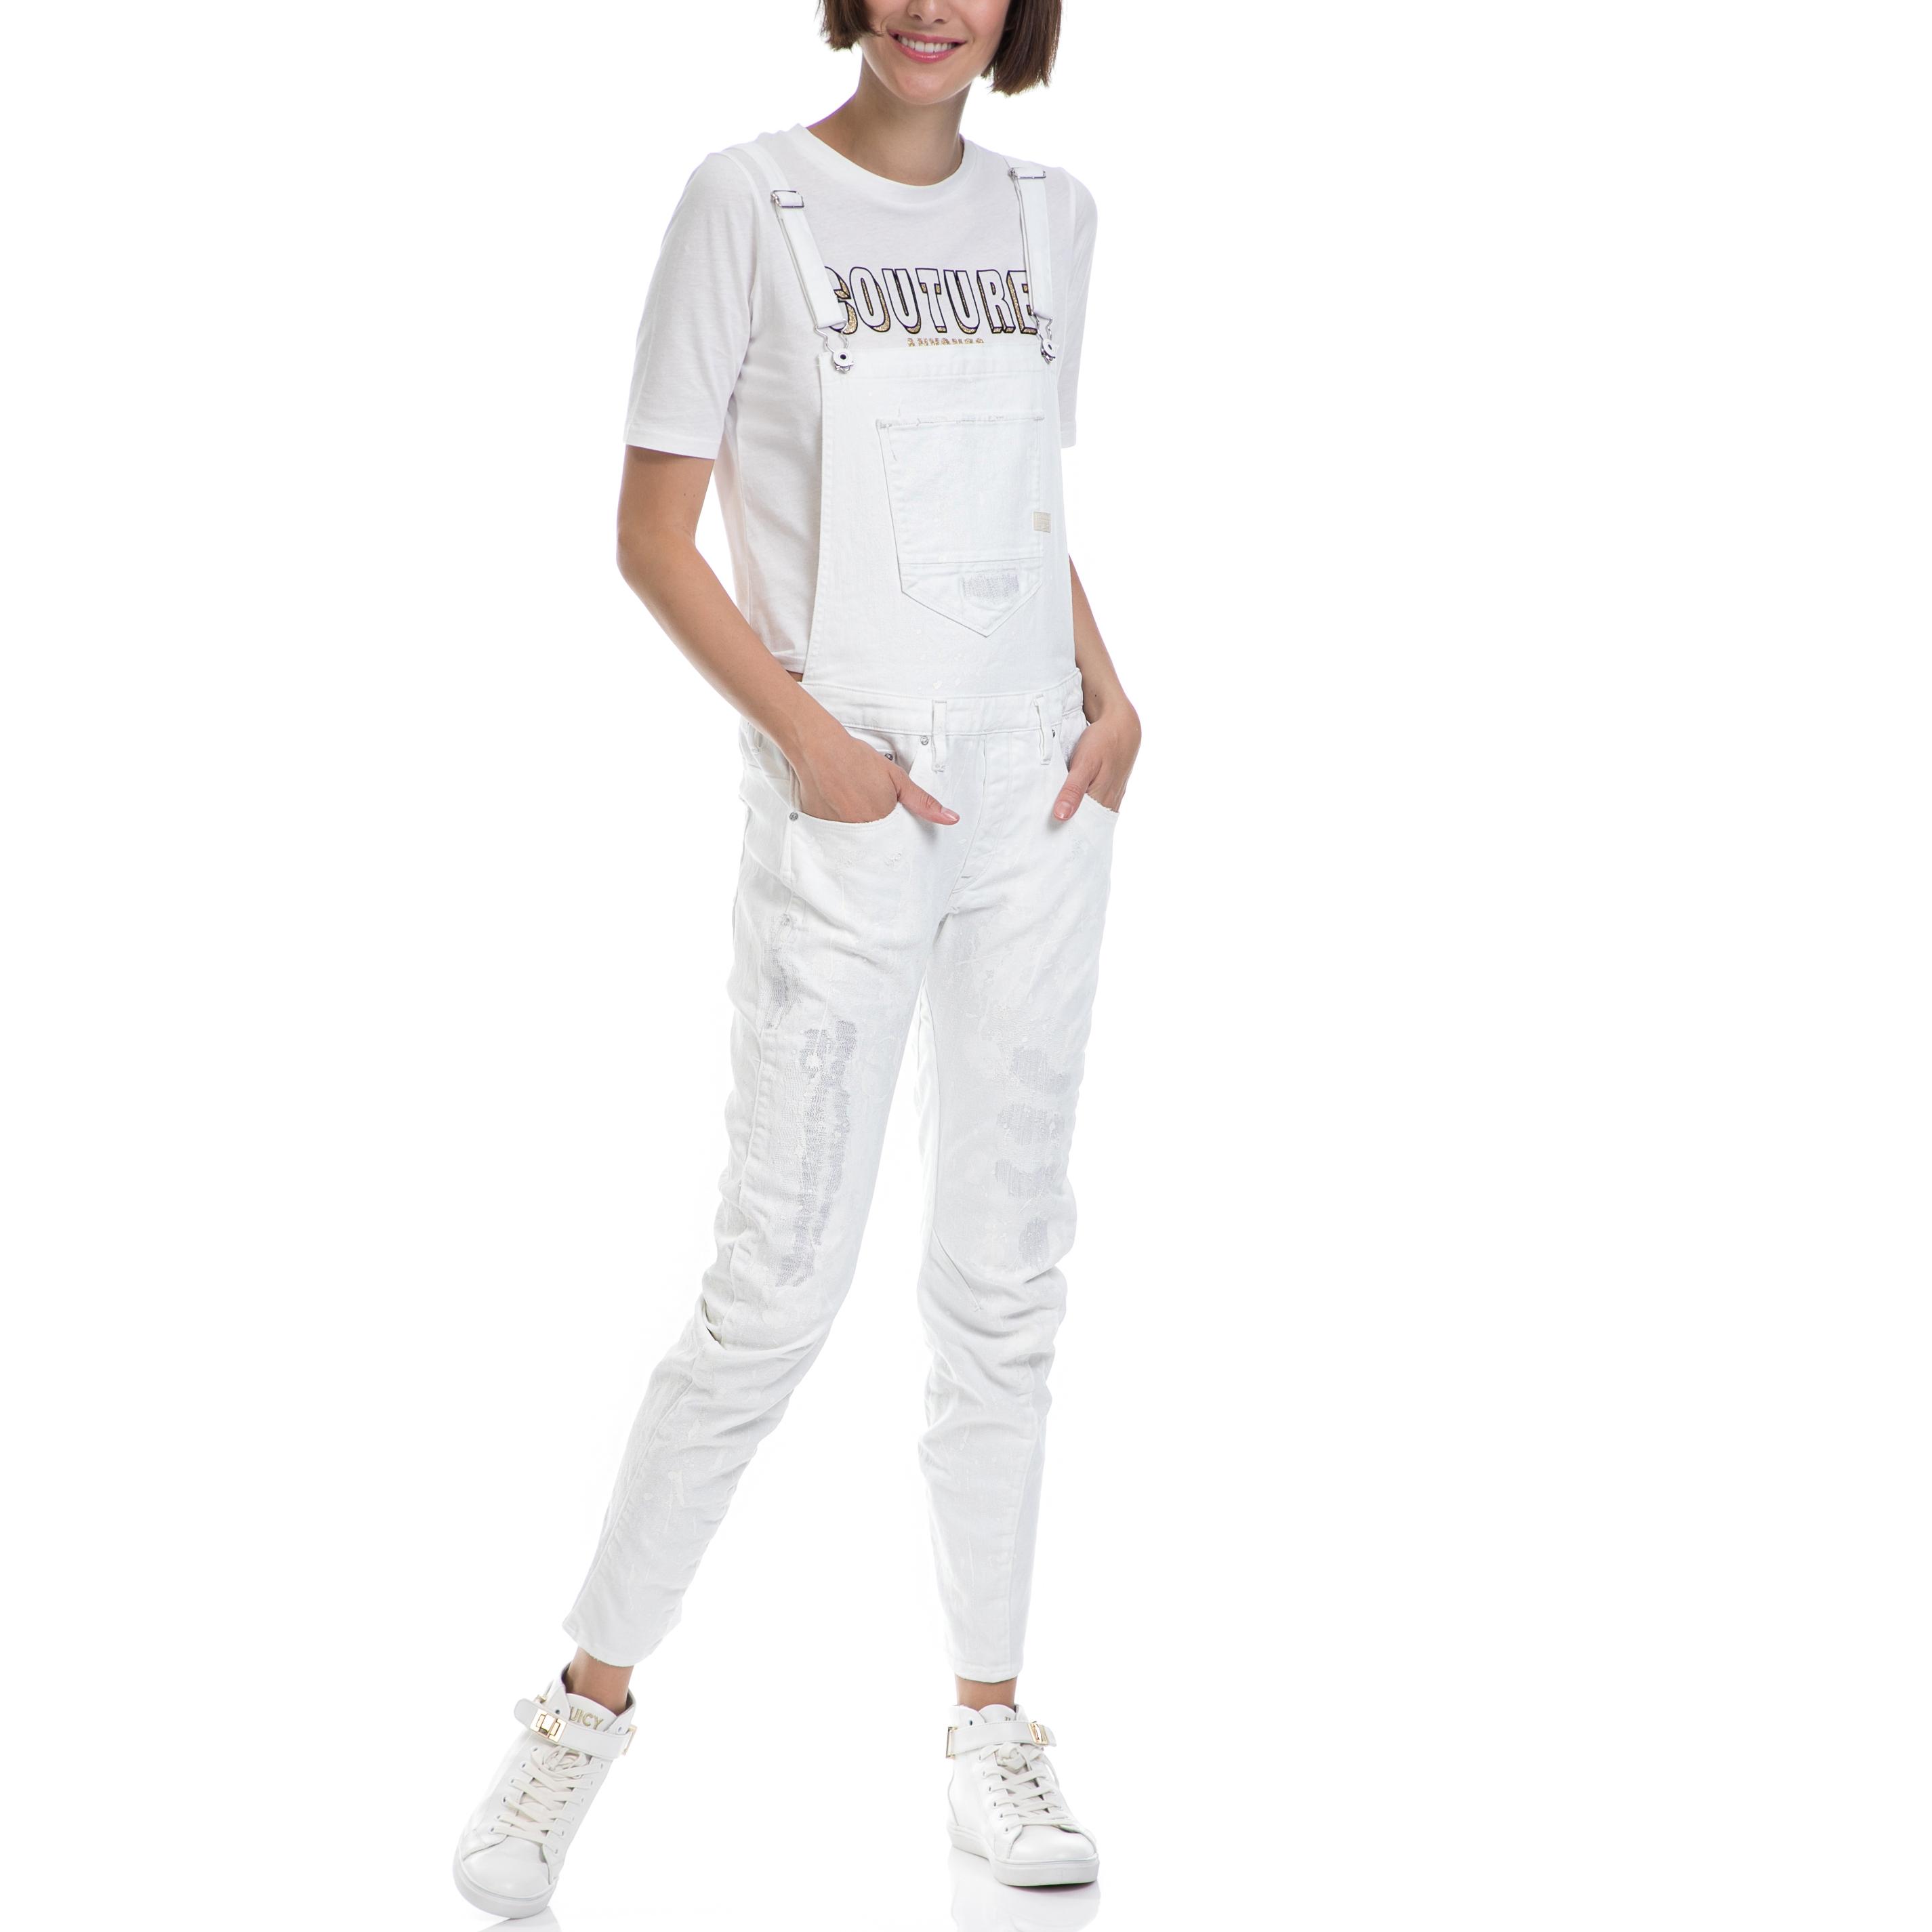 G-STAR - Ολόσωμη φόρμα G-STAR RAW άσπρη γυναικεία ρούχα ολόσωμες φόρμες